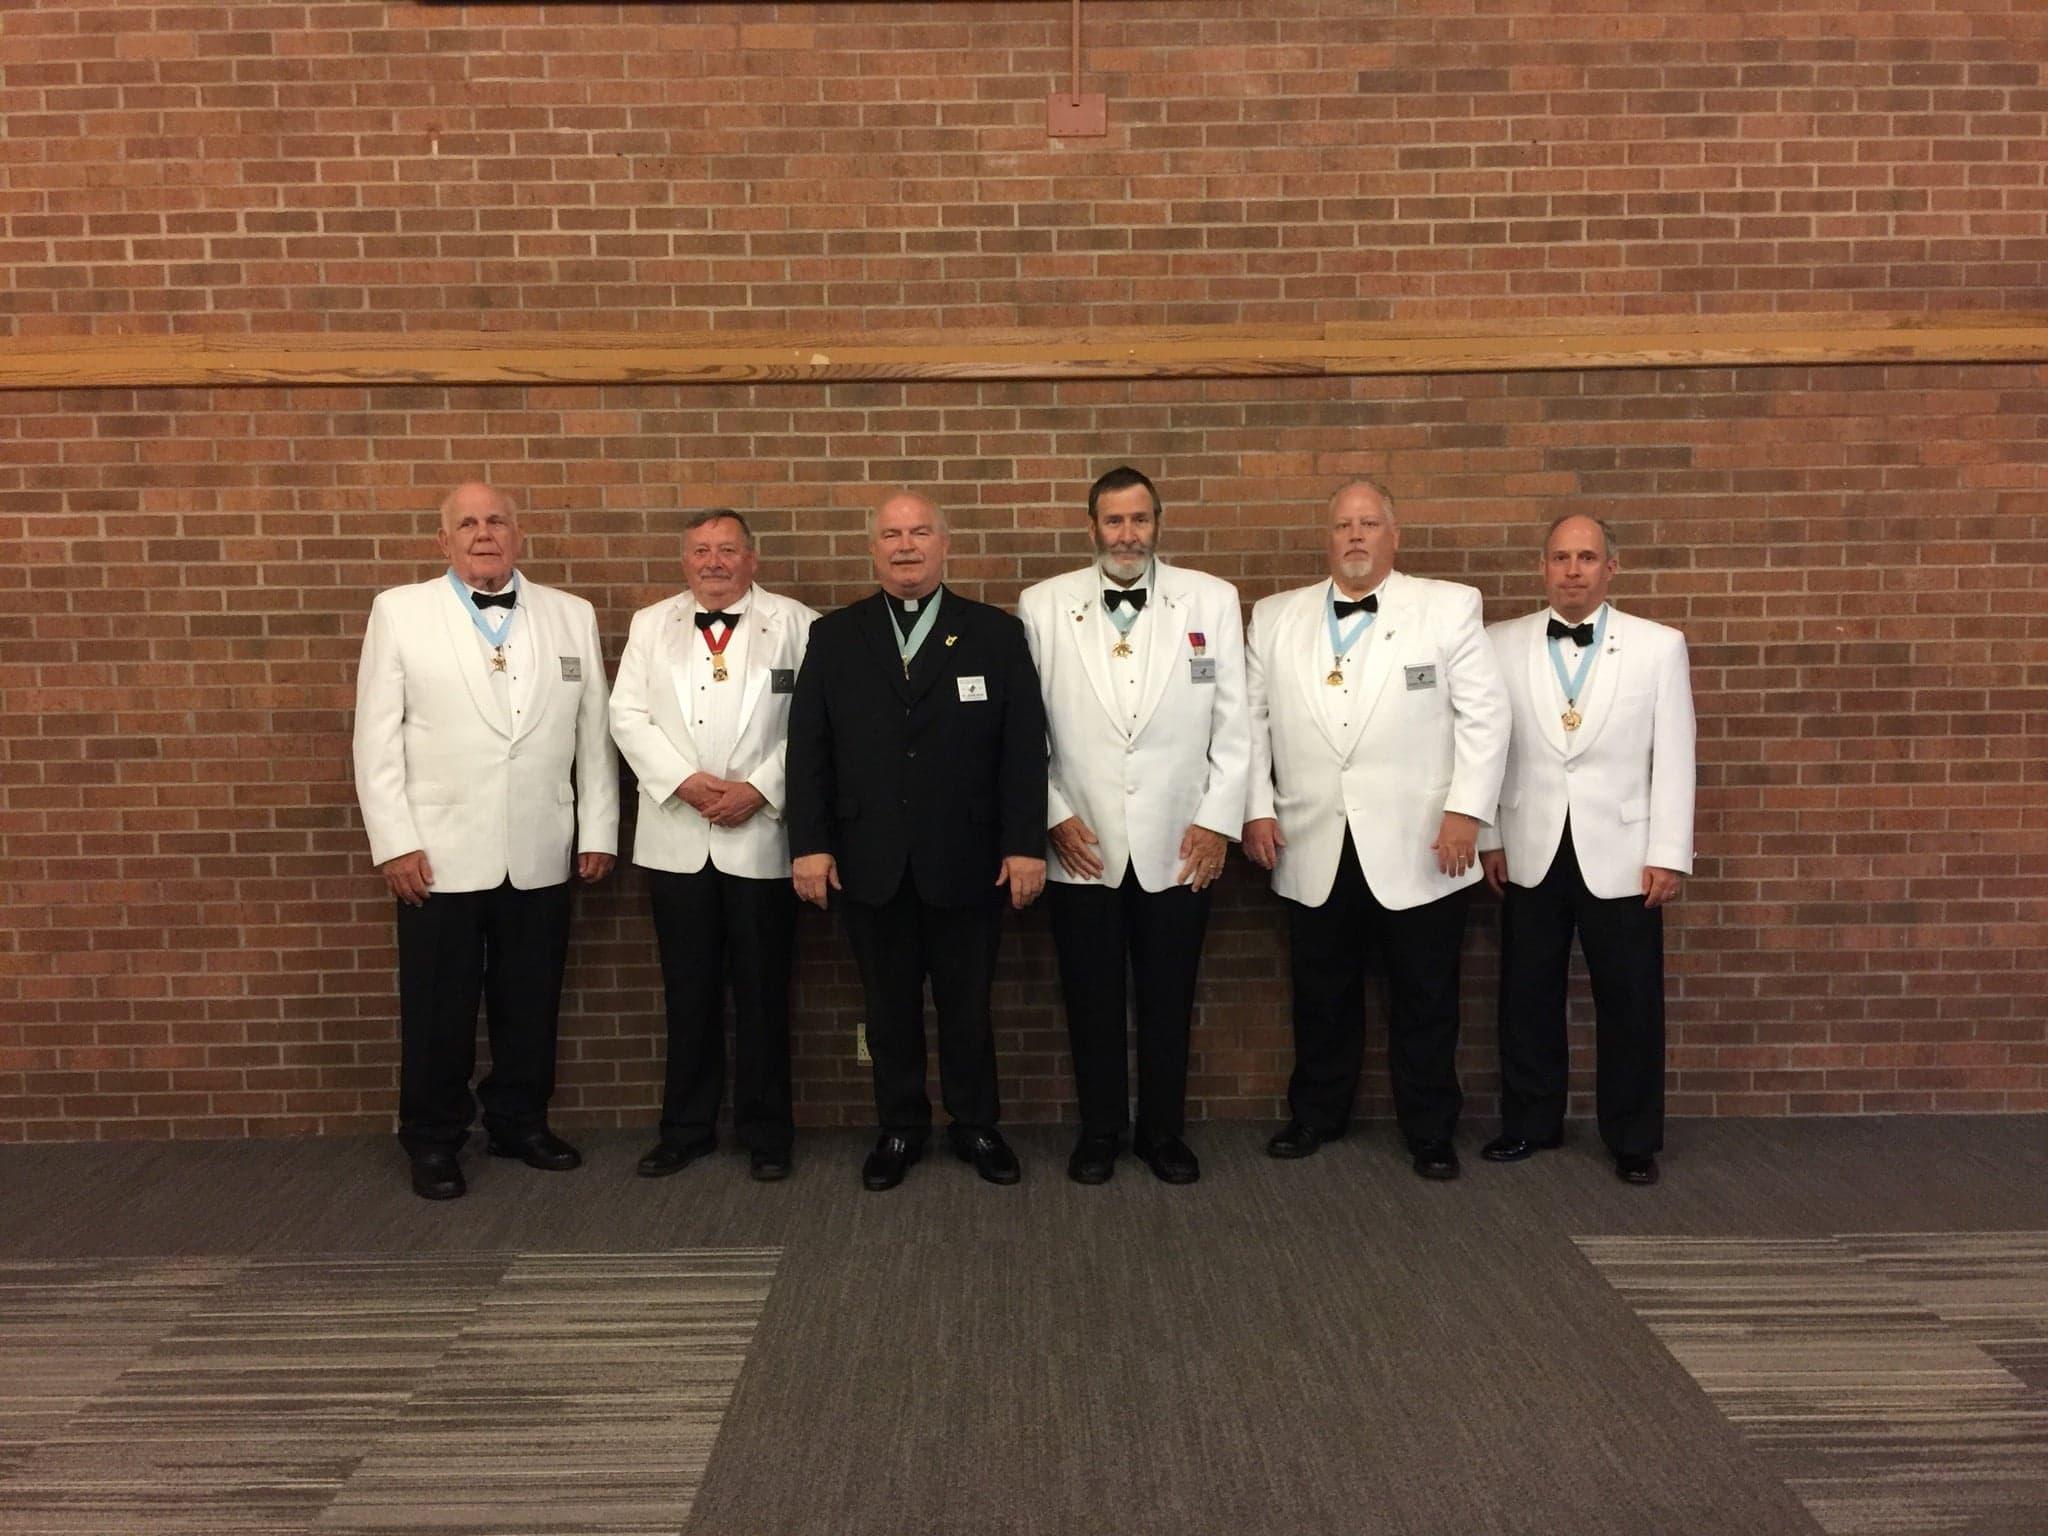 wvkofc WV Knights of Columbus Charity, Pro-Life, Catholic and Patrioti